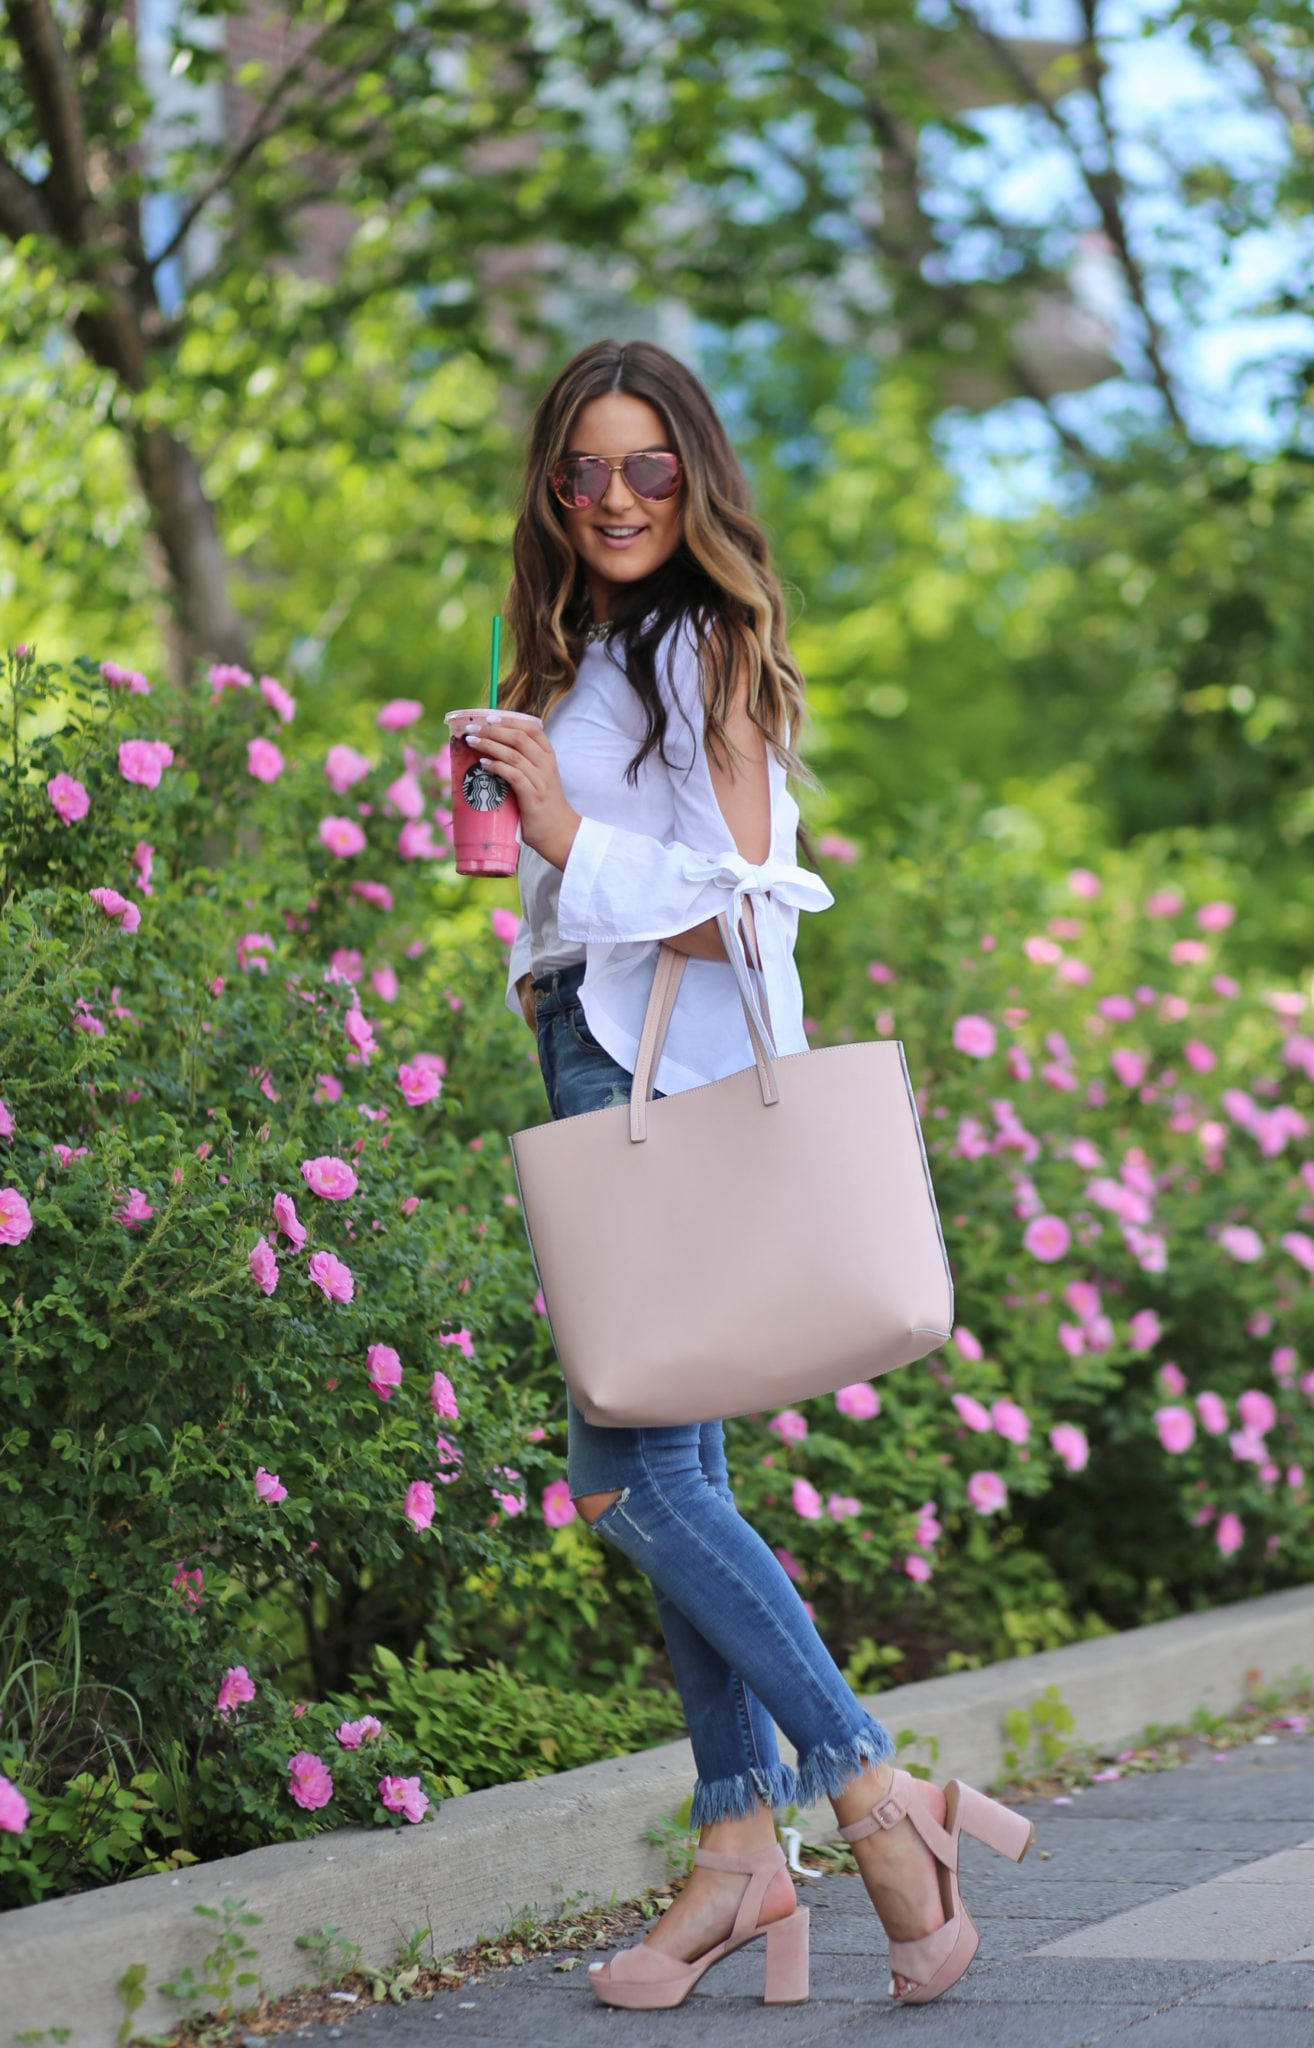 bow accent top  white   blue jeans   nude heels   sunglasses  flowers   blush purse   Mash Elle beauty blogger   summer fashion